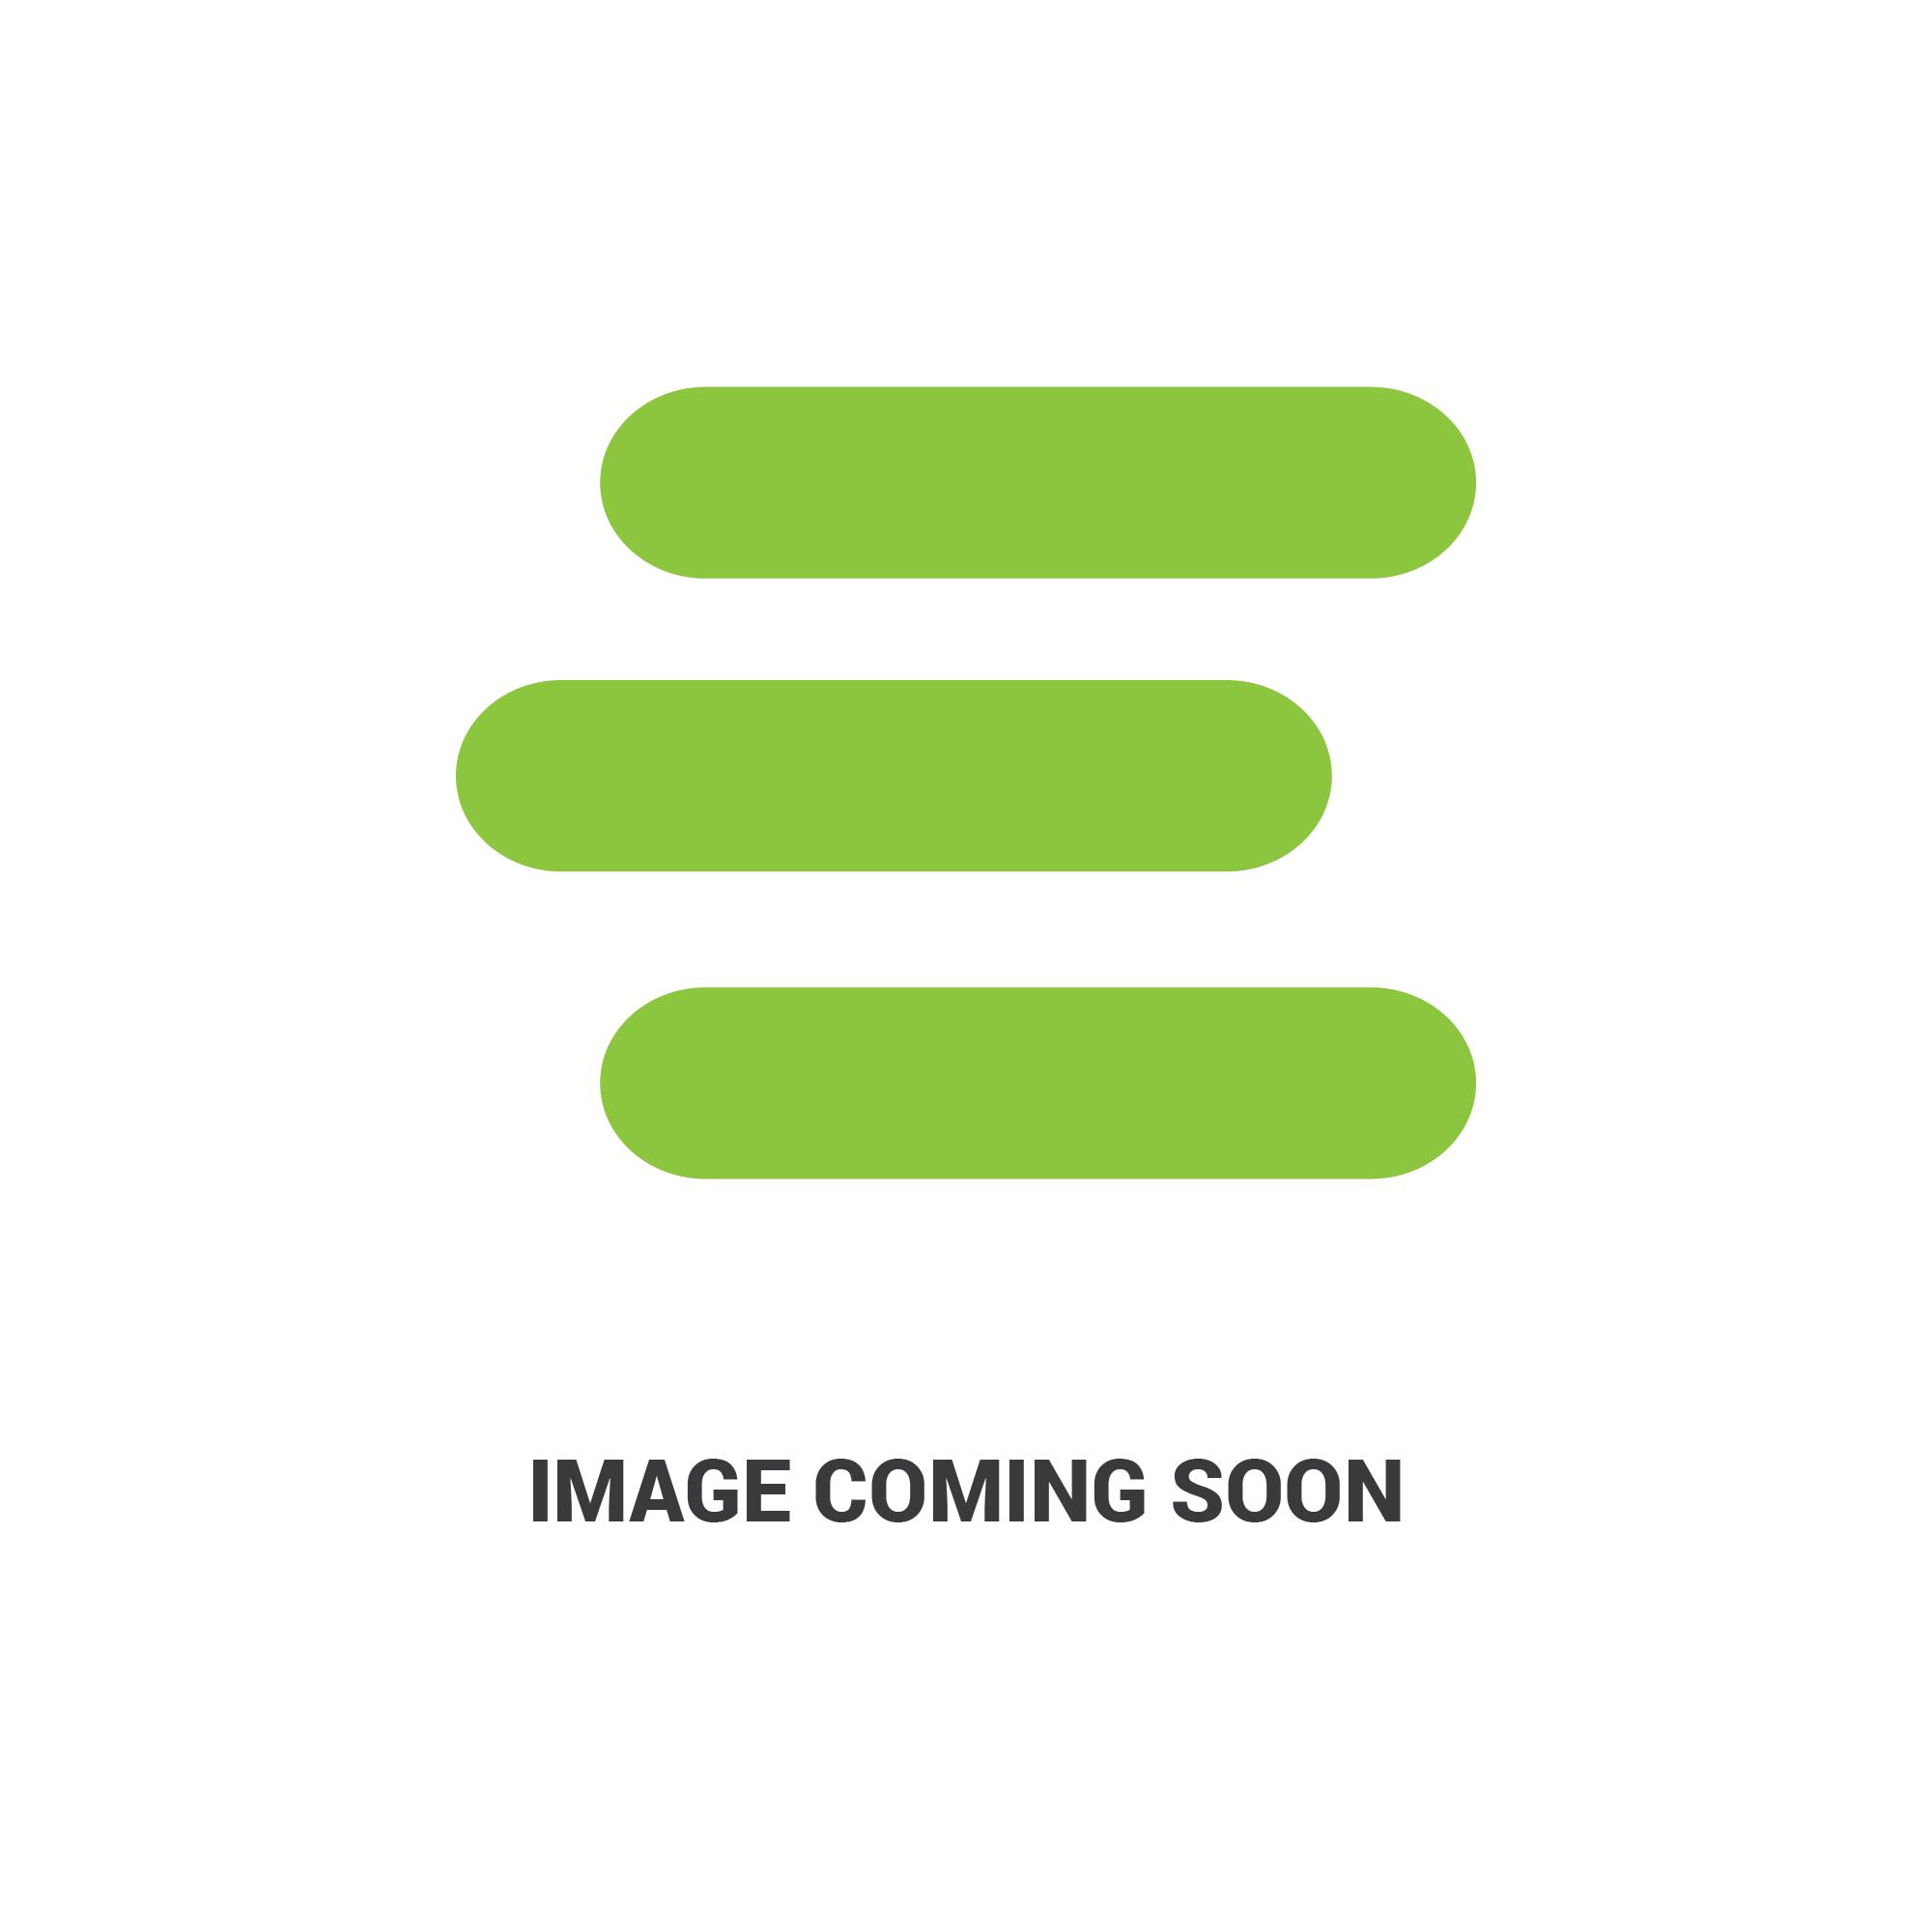 E-957E7213Aedit 1.jpg